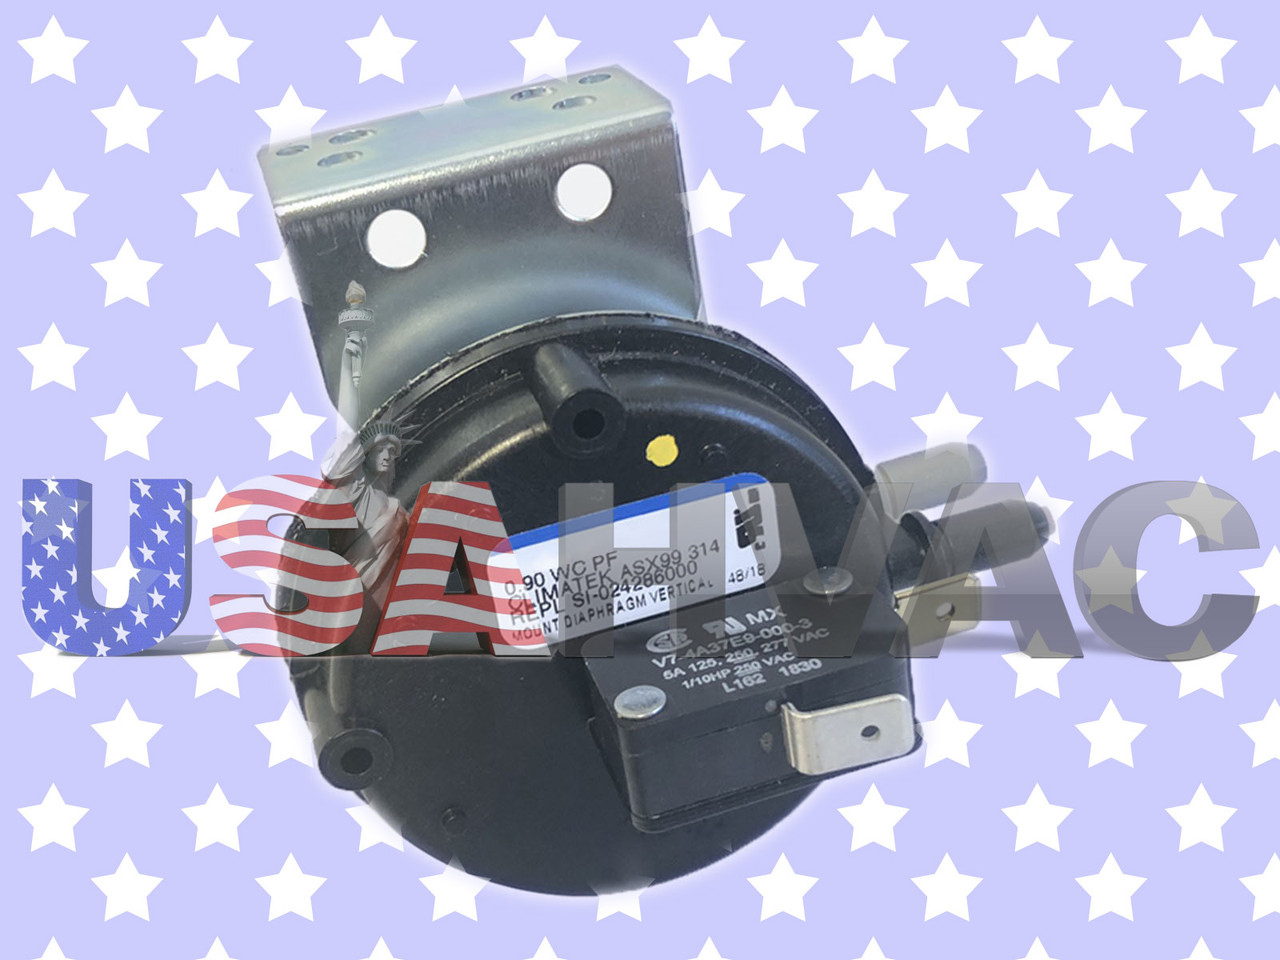 42-24064-01 Rheem OEM Furnace Replacement Air Pressure Switch